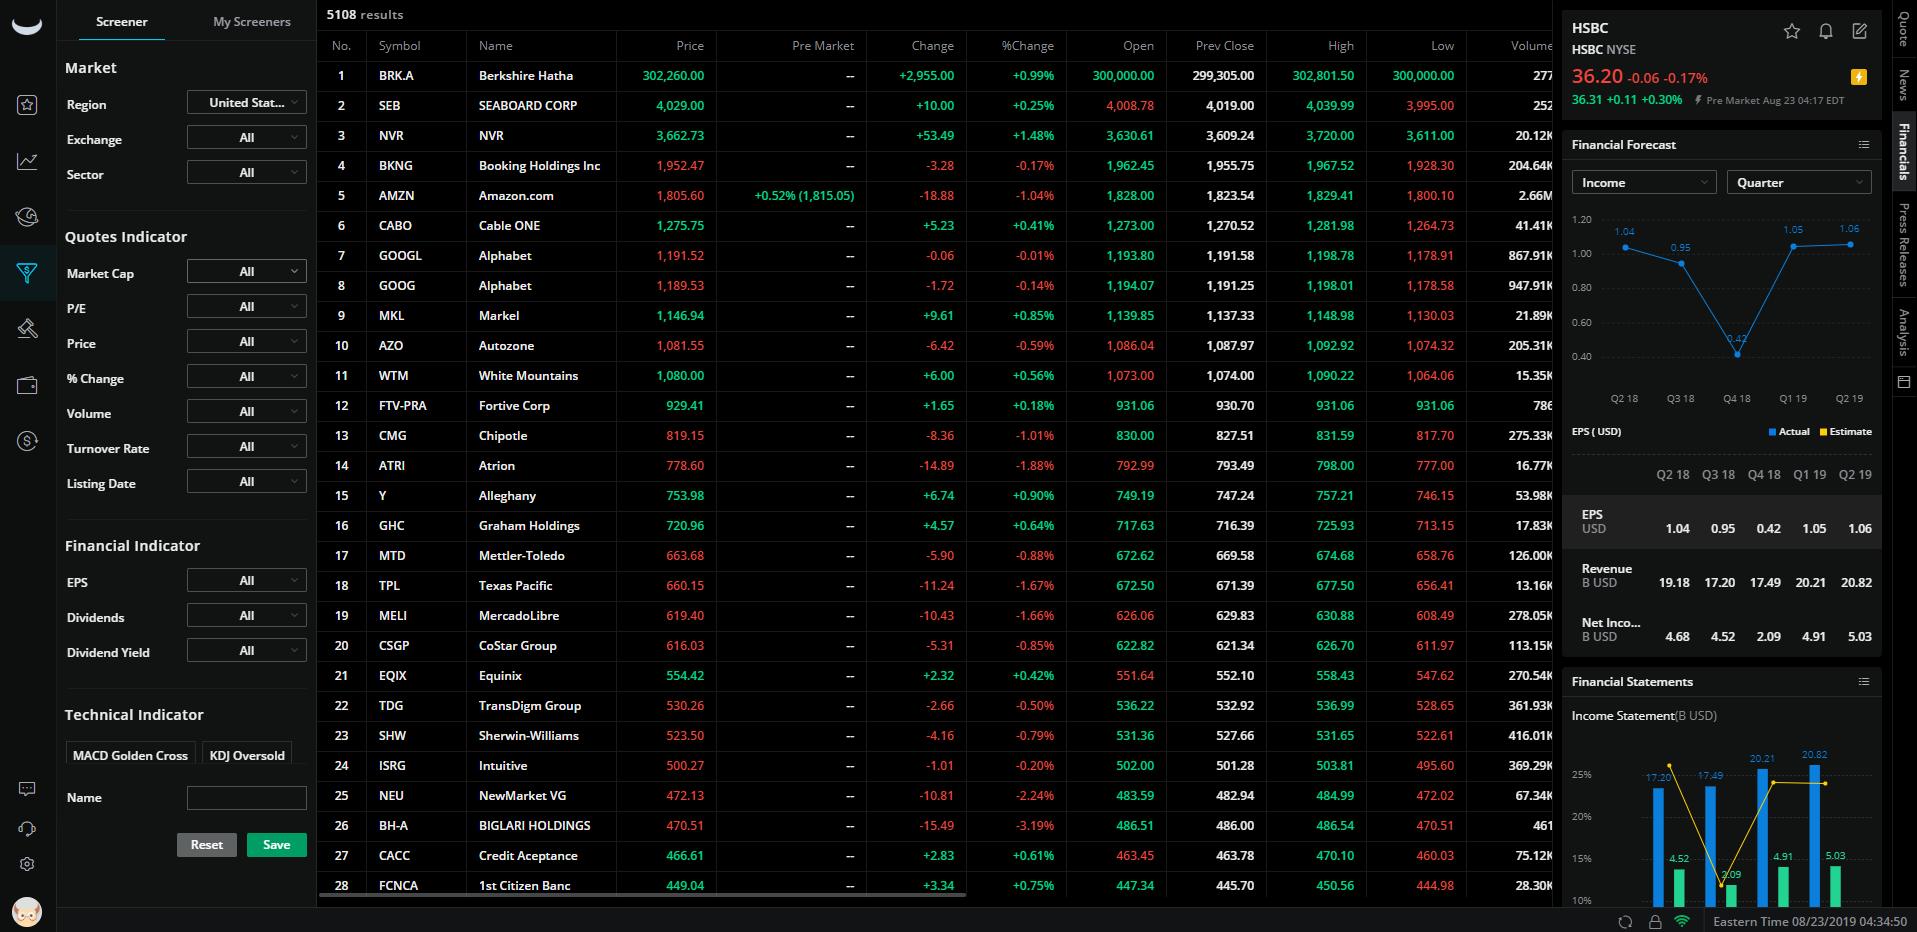 Webull review - Research - Stock Screener